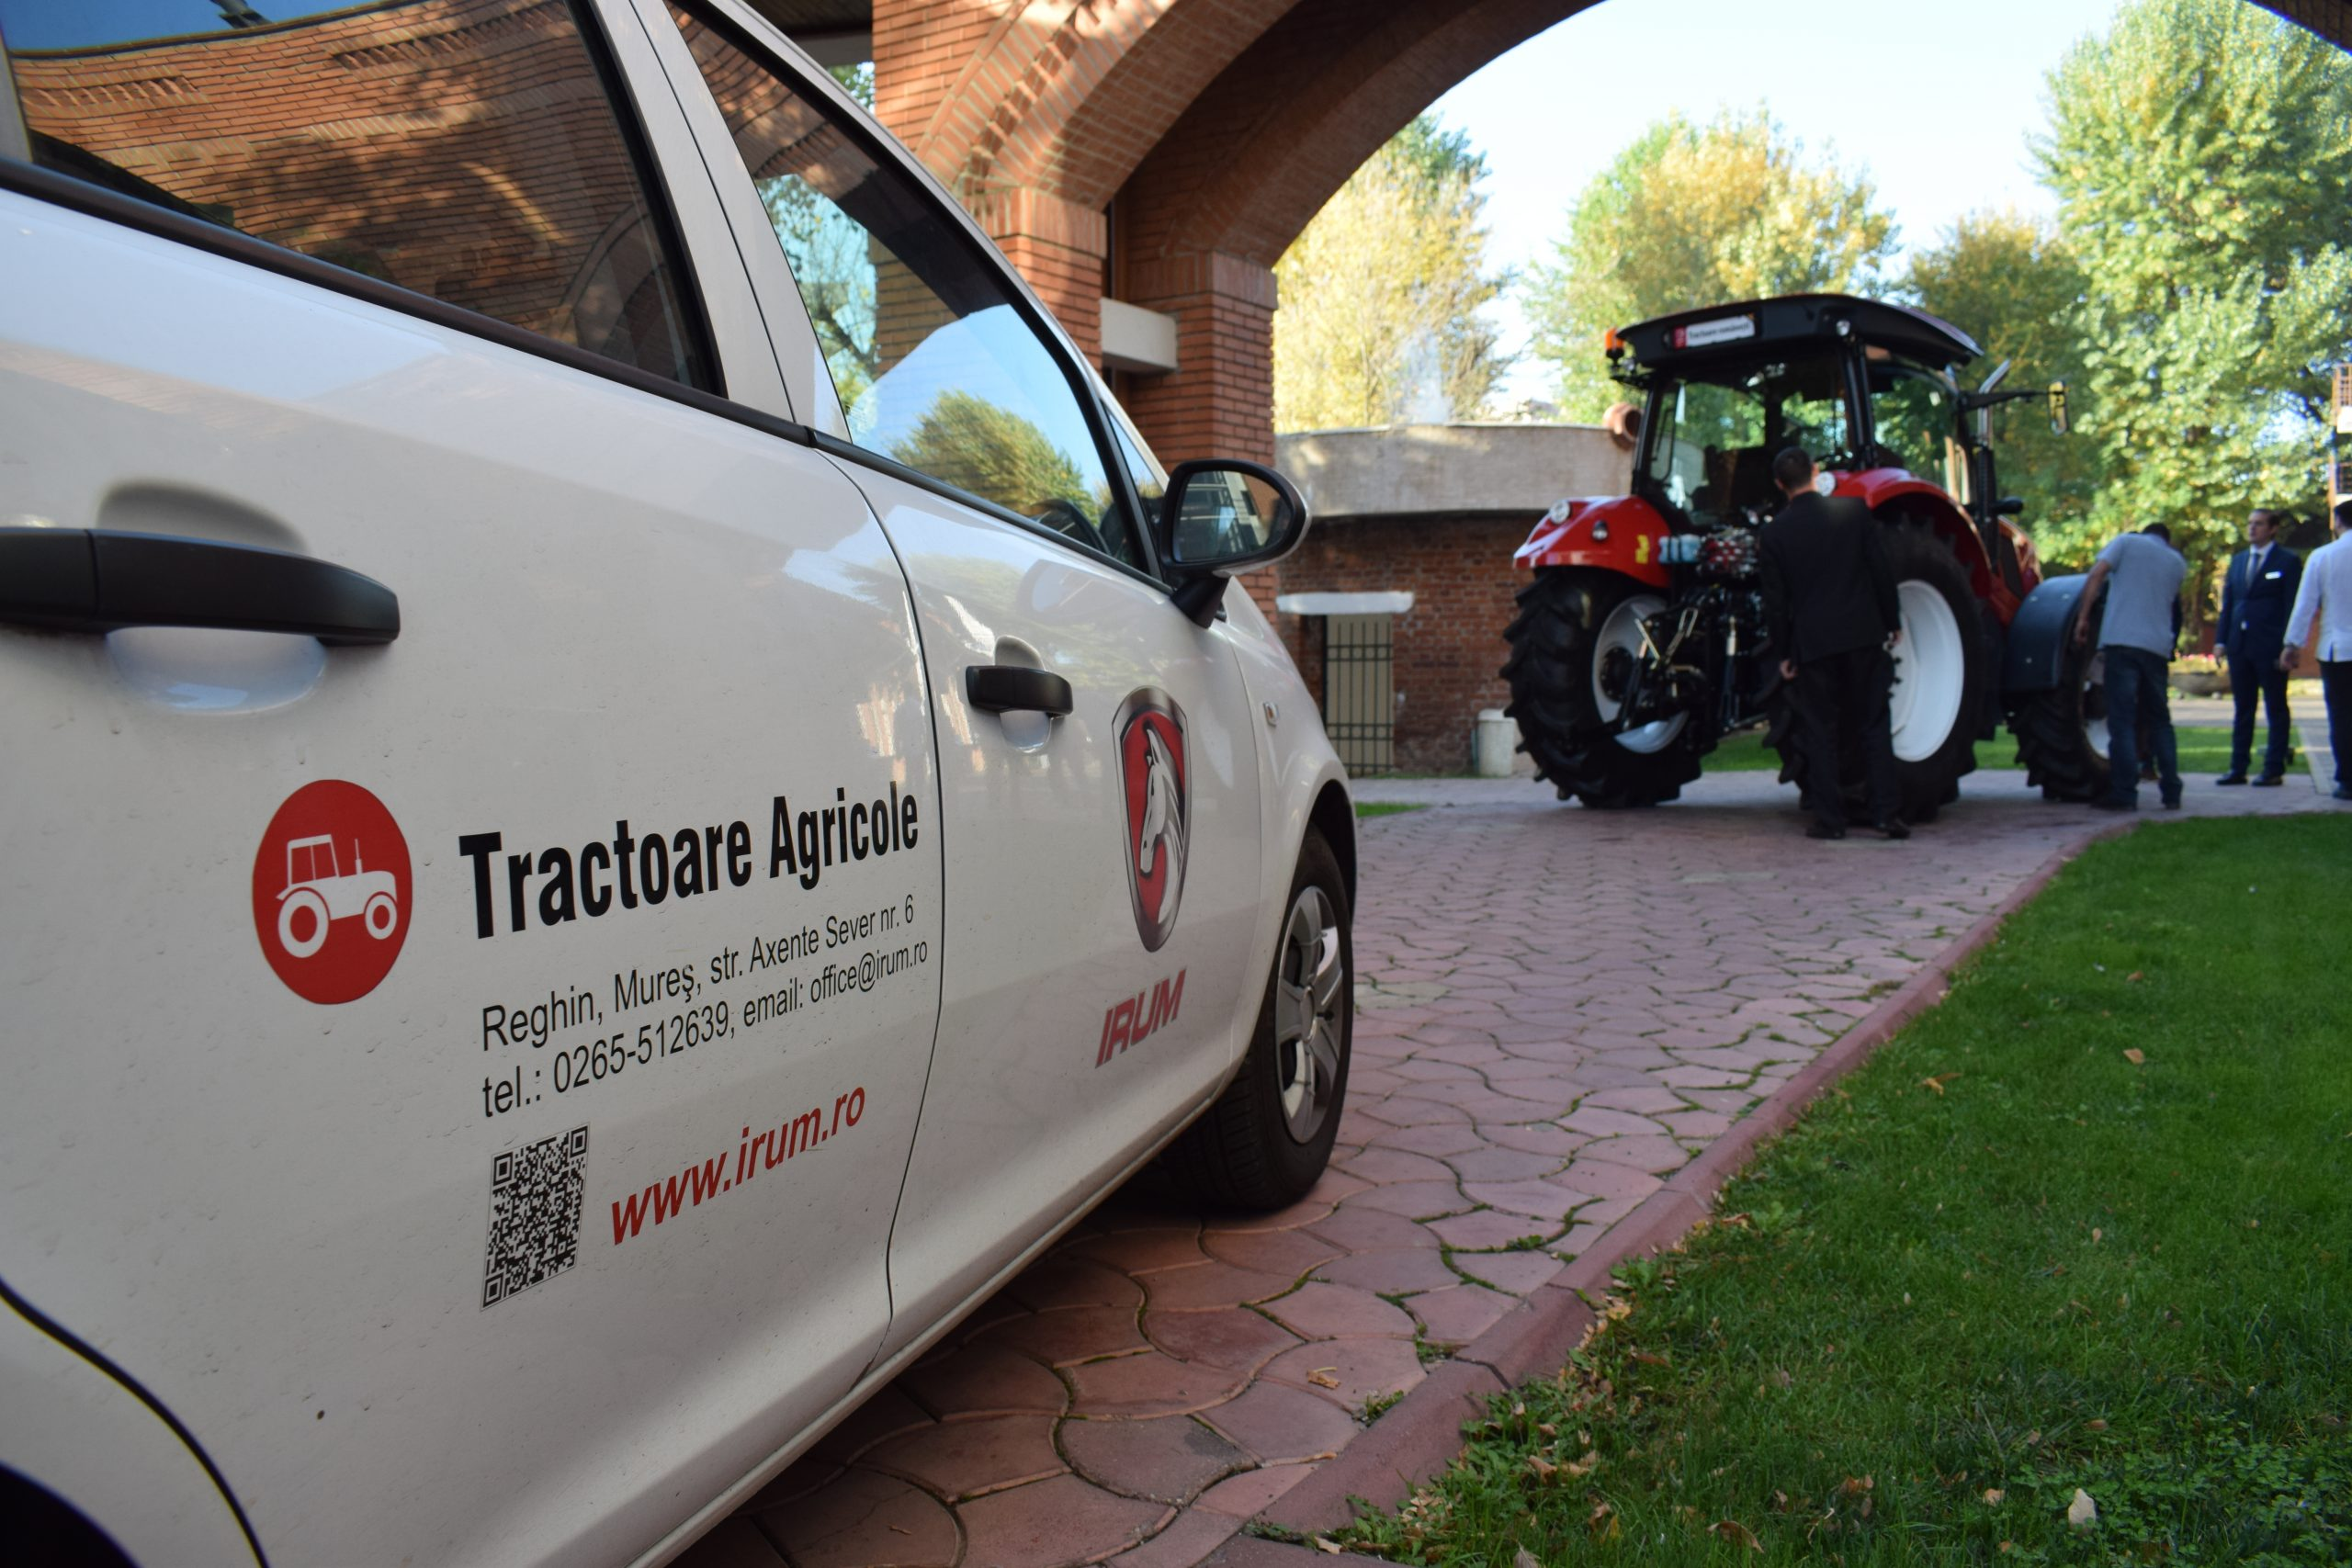 Tractor romanesc Tagro Irum spate